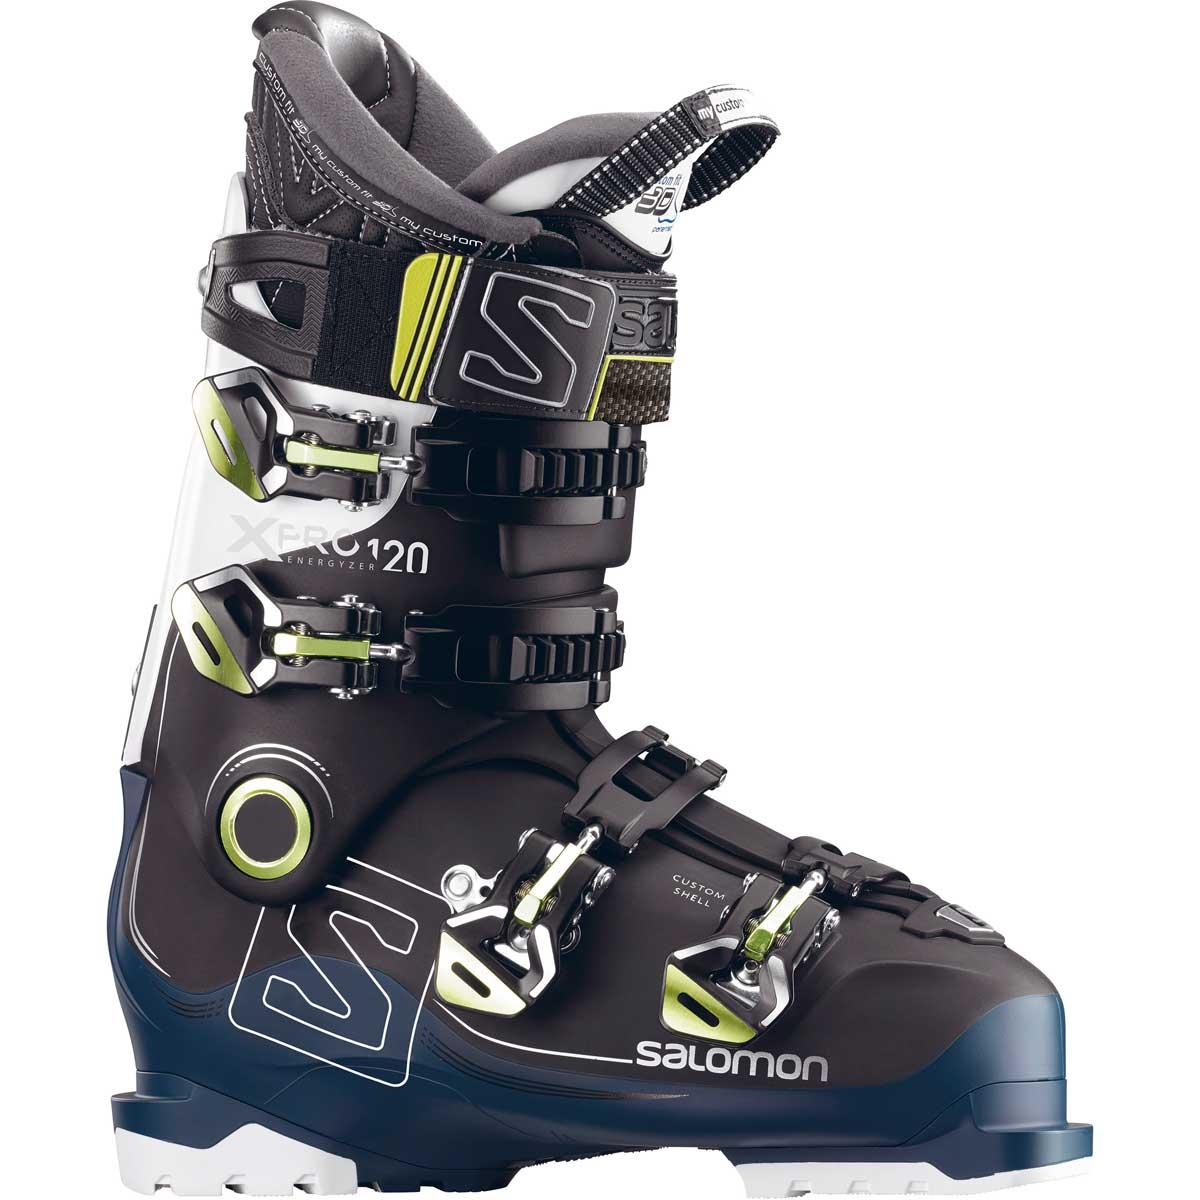 Salomon Men's X Pro 120 Ski Boots On Sale